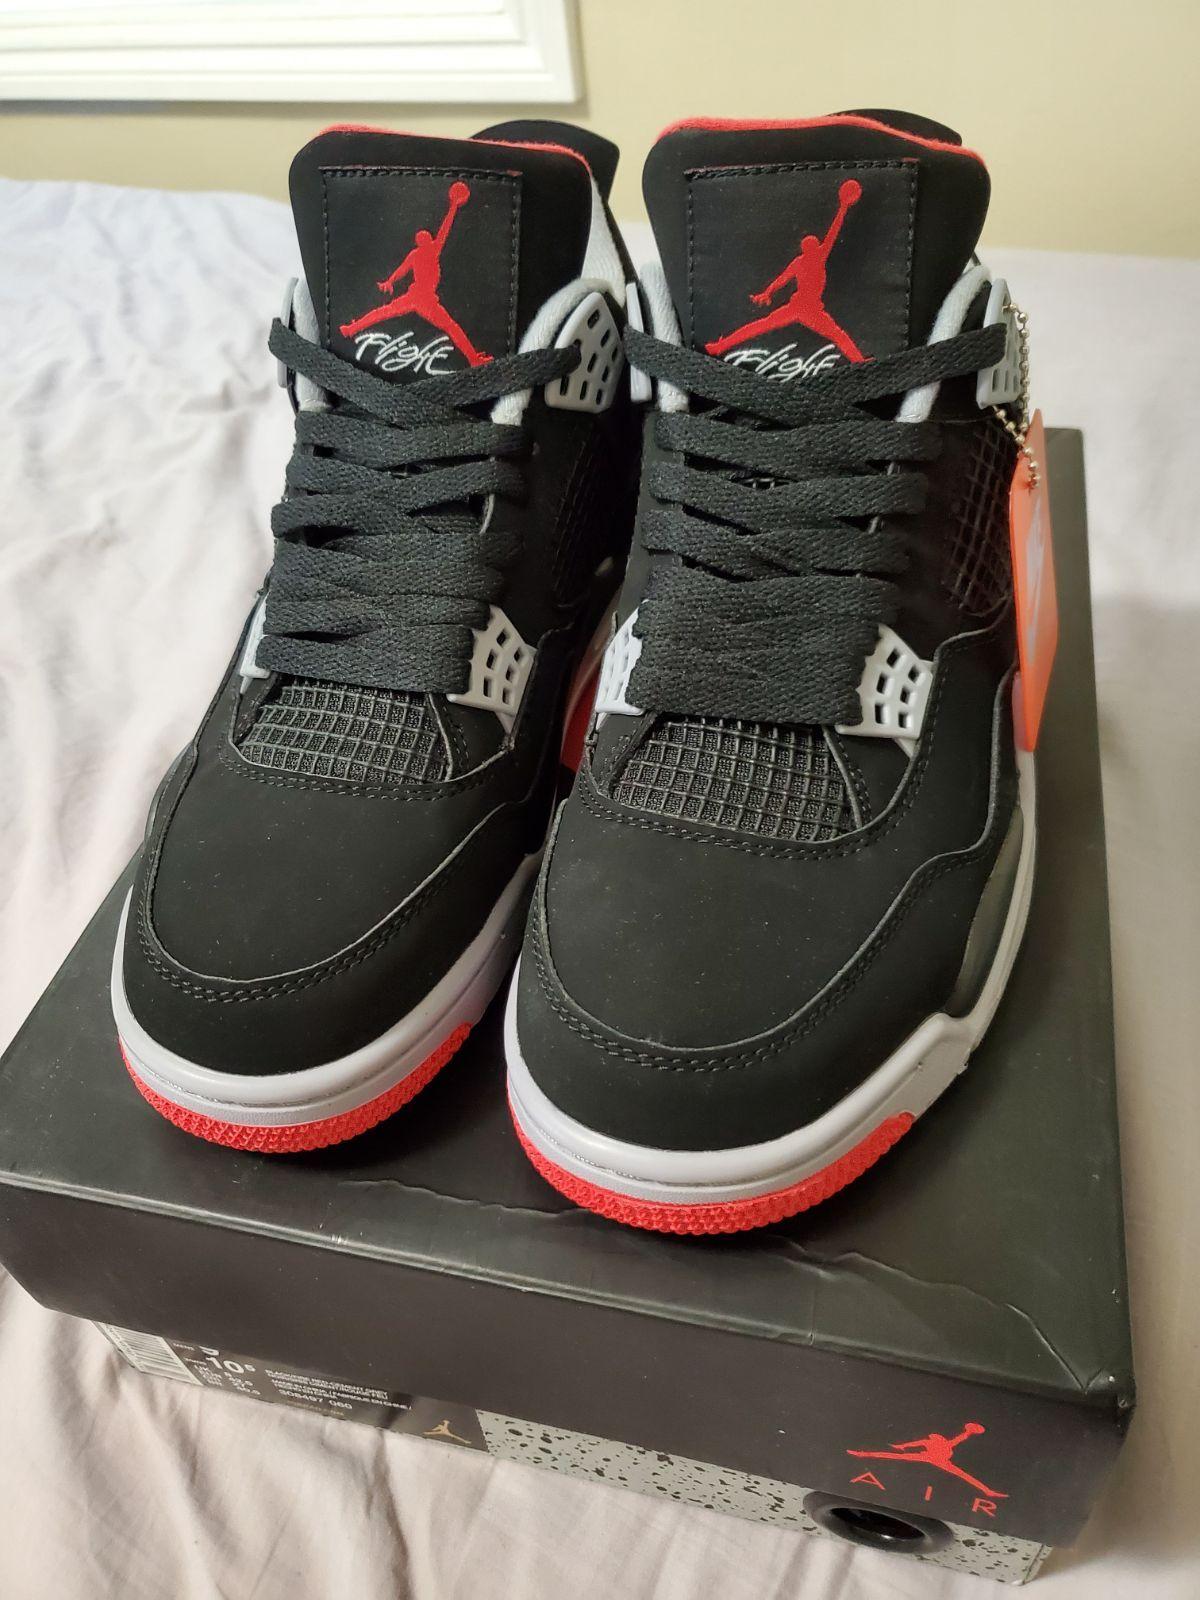 Nike Air Jordan 4 Retro Bred 2019 Size